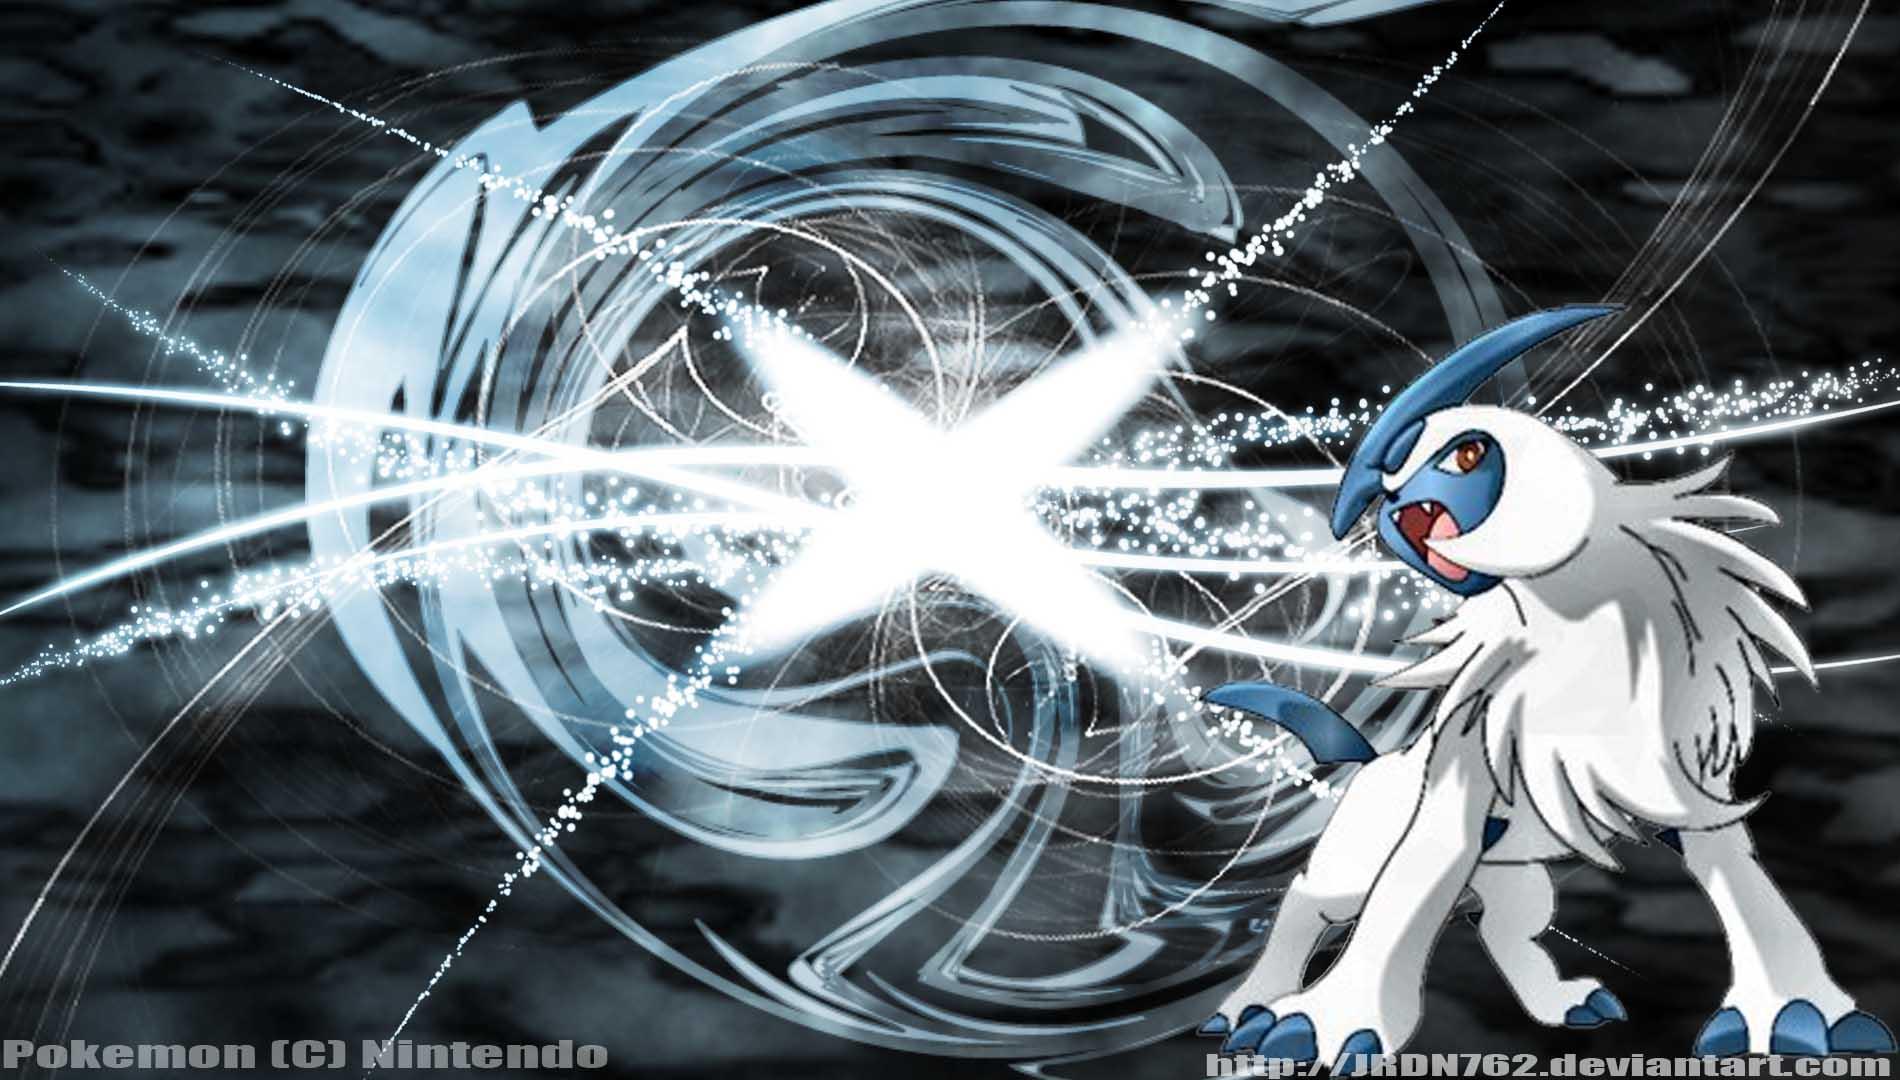 Pokemon Absol Absol wallpaper by jrdn762 1900x1080